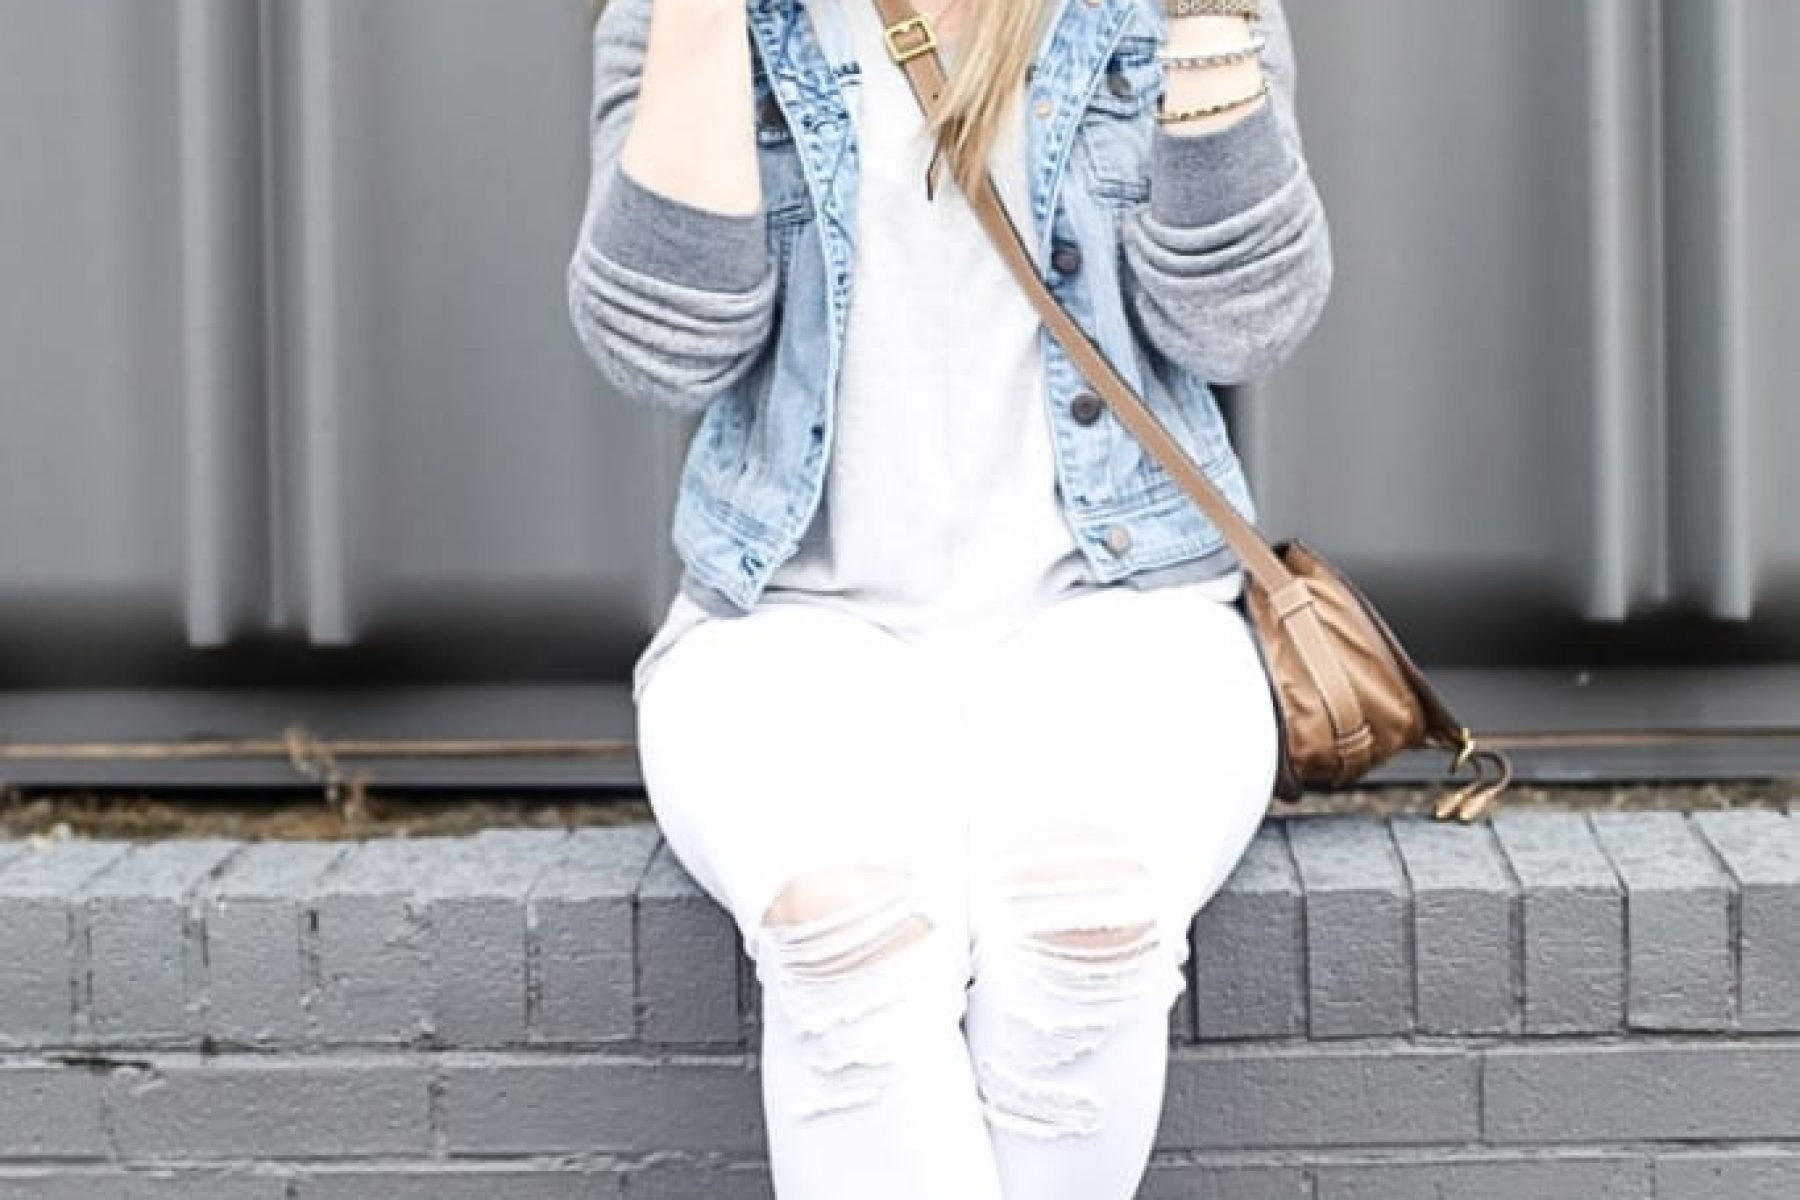 Free People Denim Jacket, American Eagle Jacket, Chloe Bag, Spring Fashion, Blogger (3 of 4)